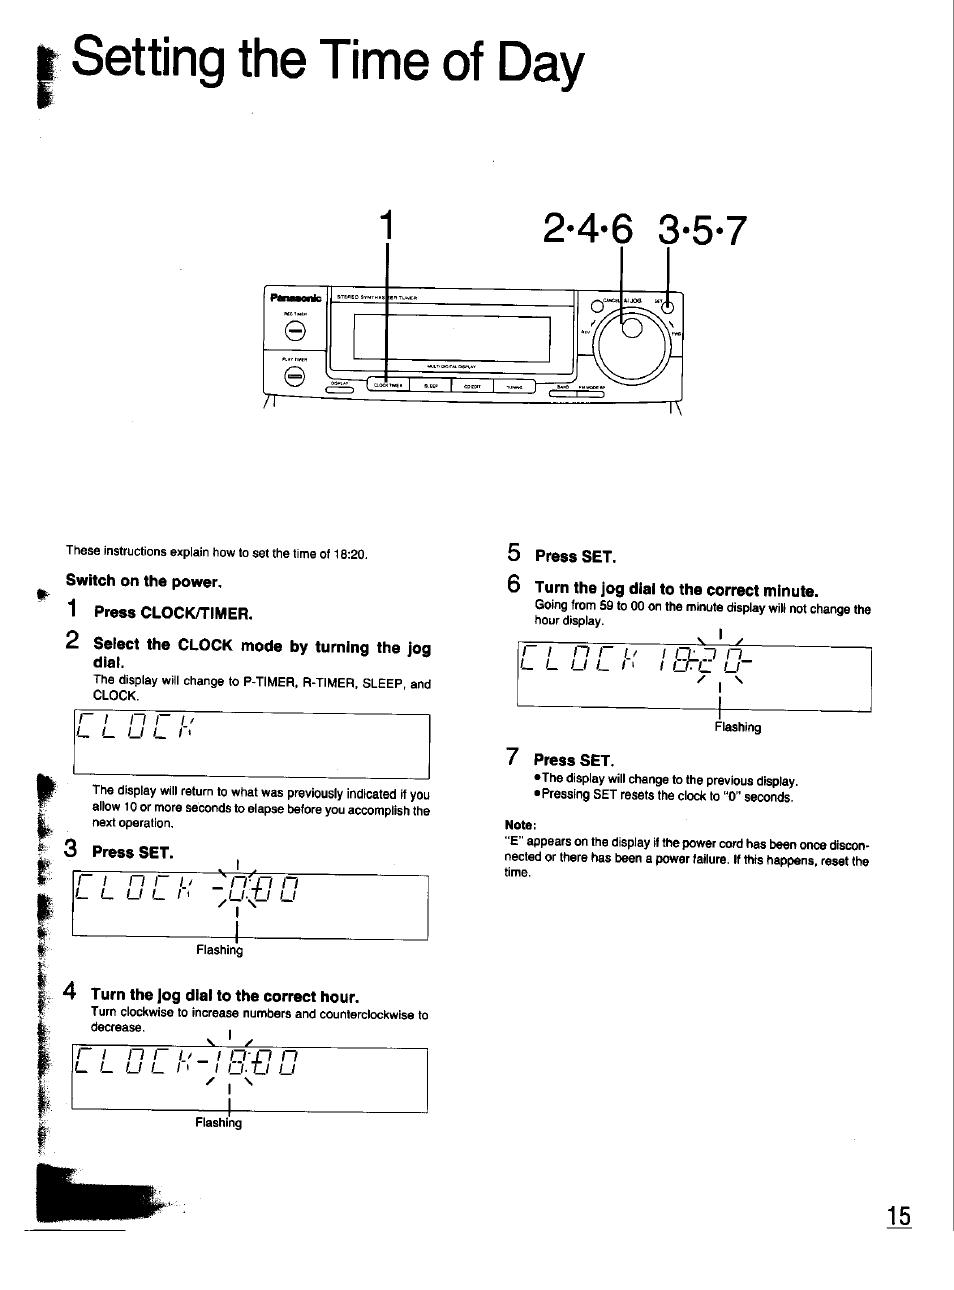 setting the time of day switch on the power 1 press clock timer rh manualsdir com Panasonic Manual Ra 6800 Panasonic TV Manual